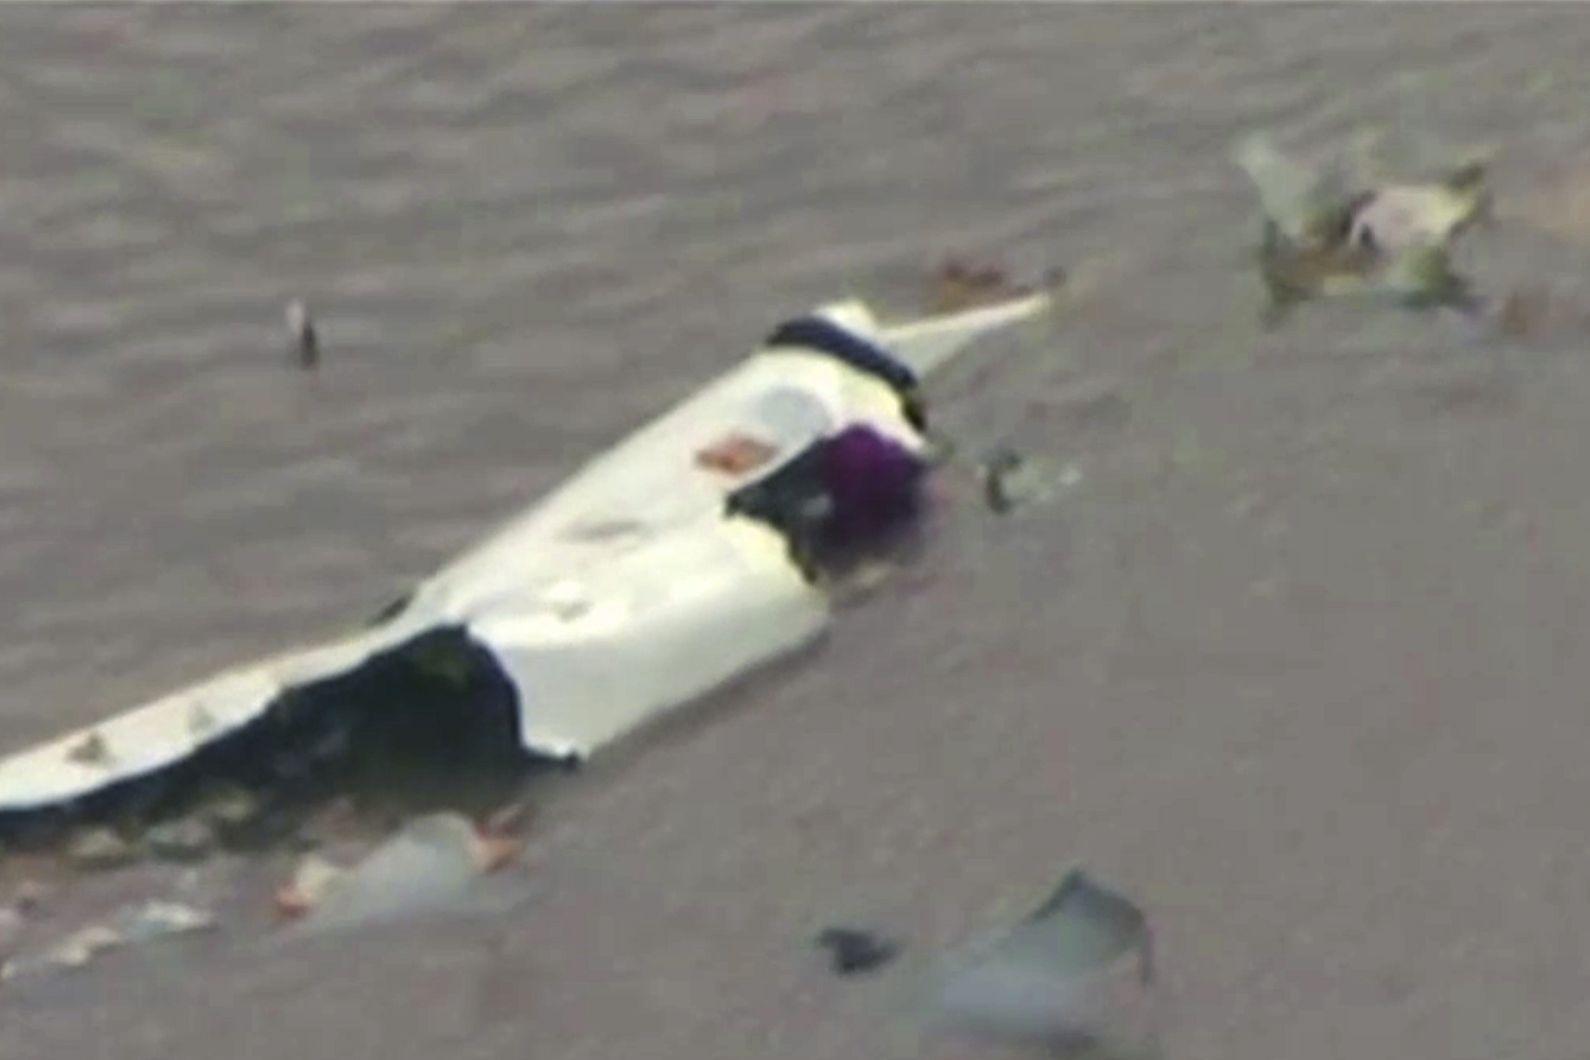 Sheriff: No likely survivors in jetliner crash near Houston